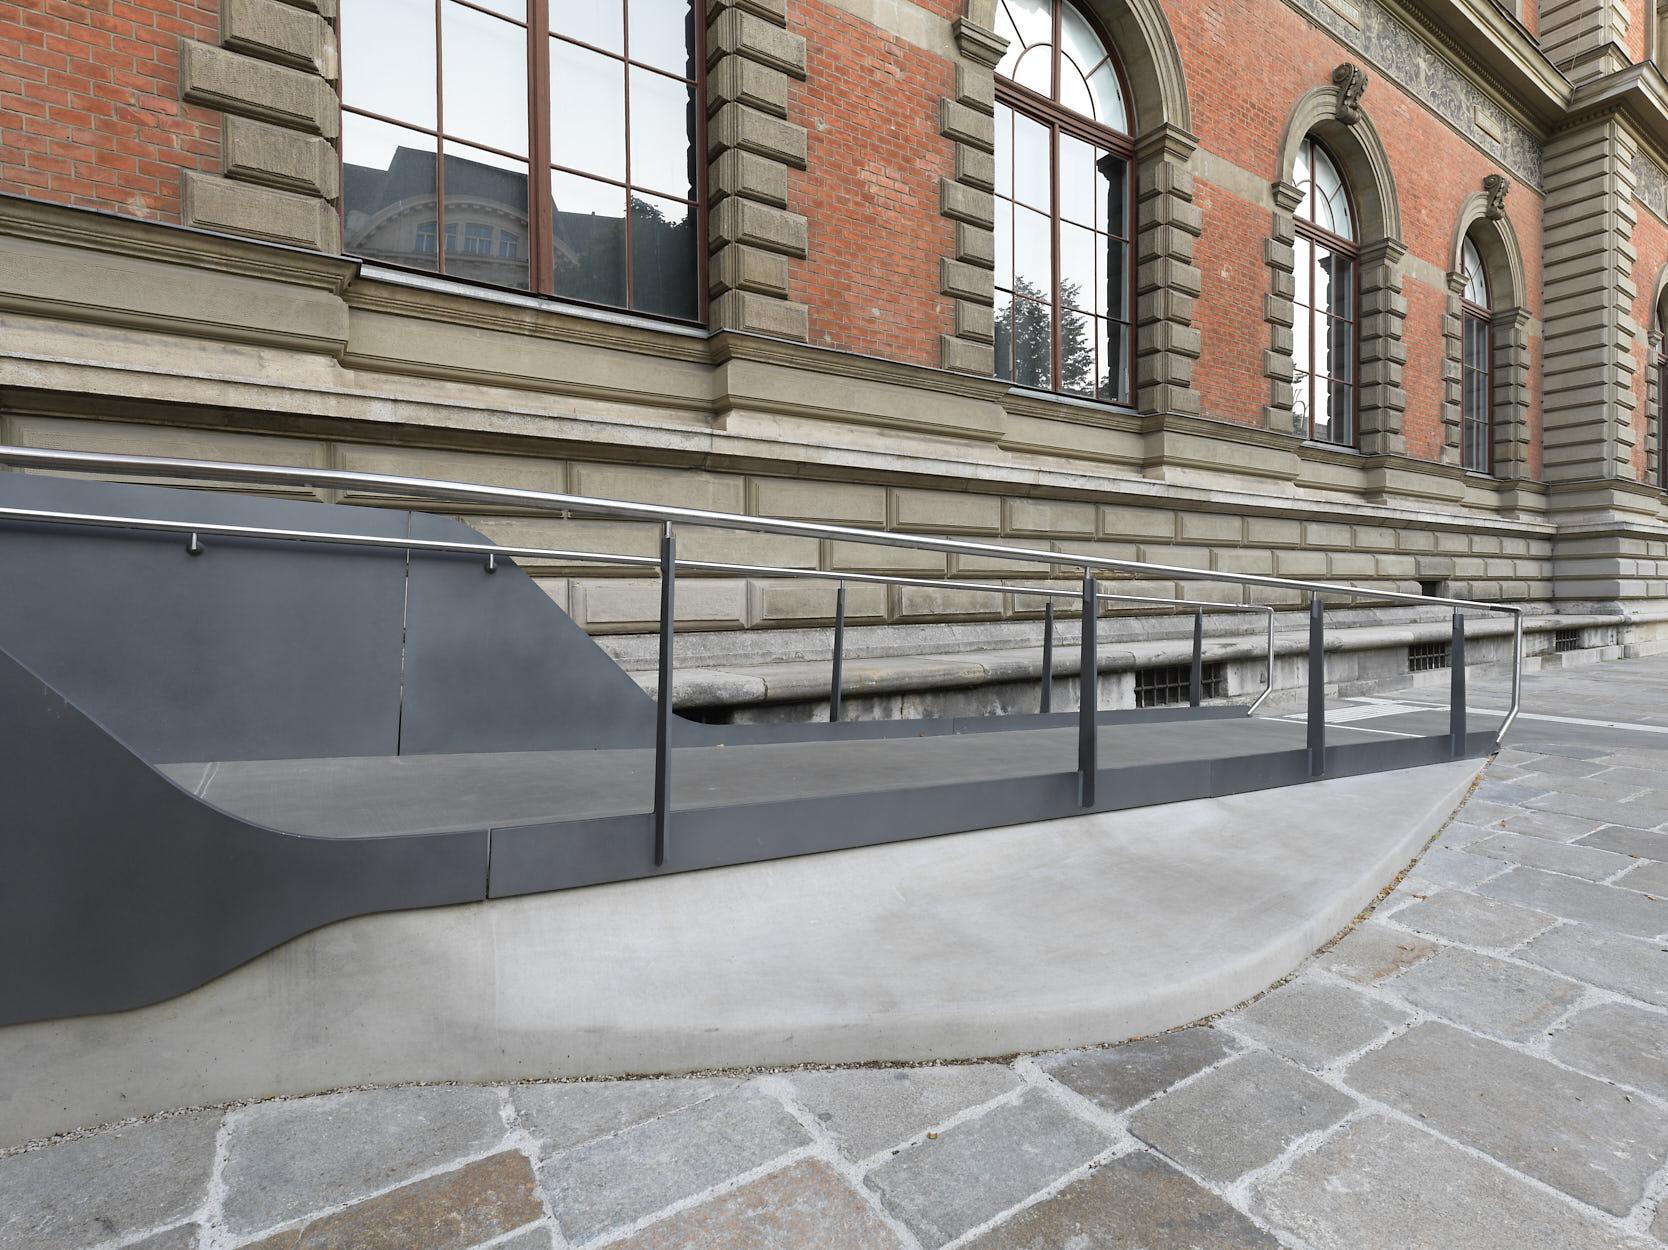 MAK New Entrance: Ramp